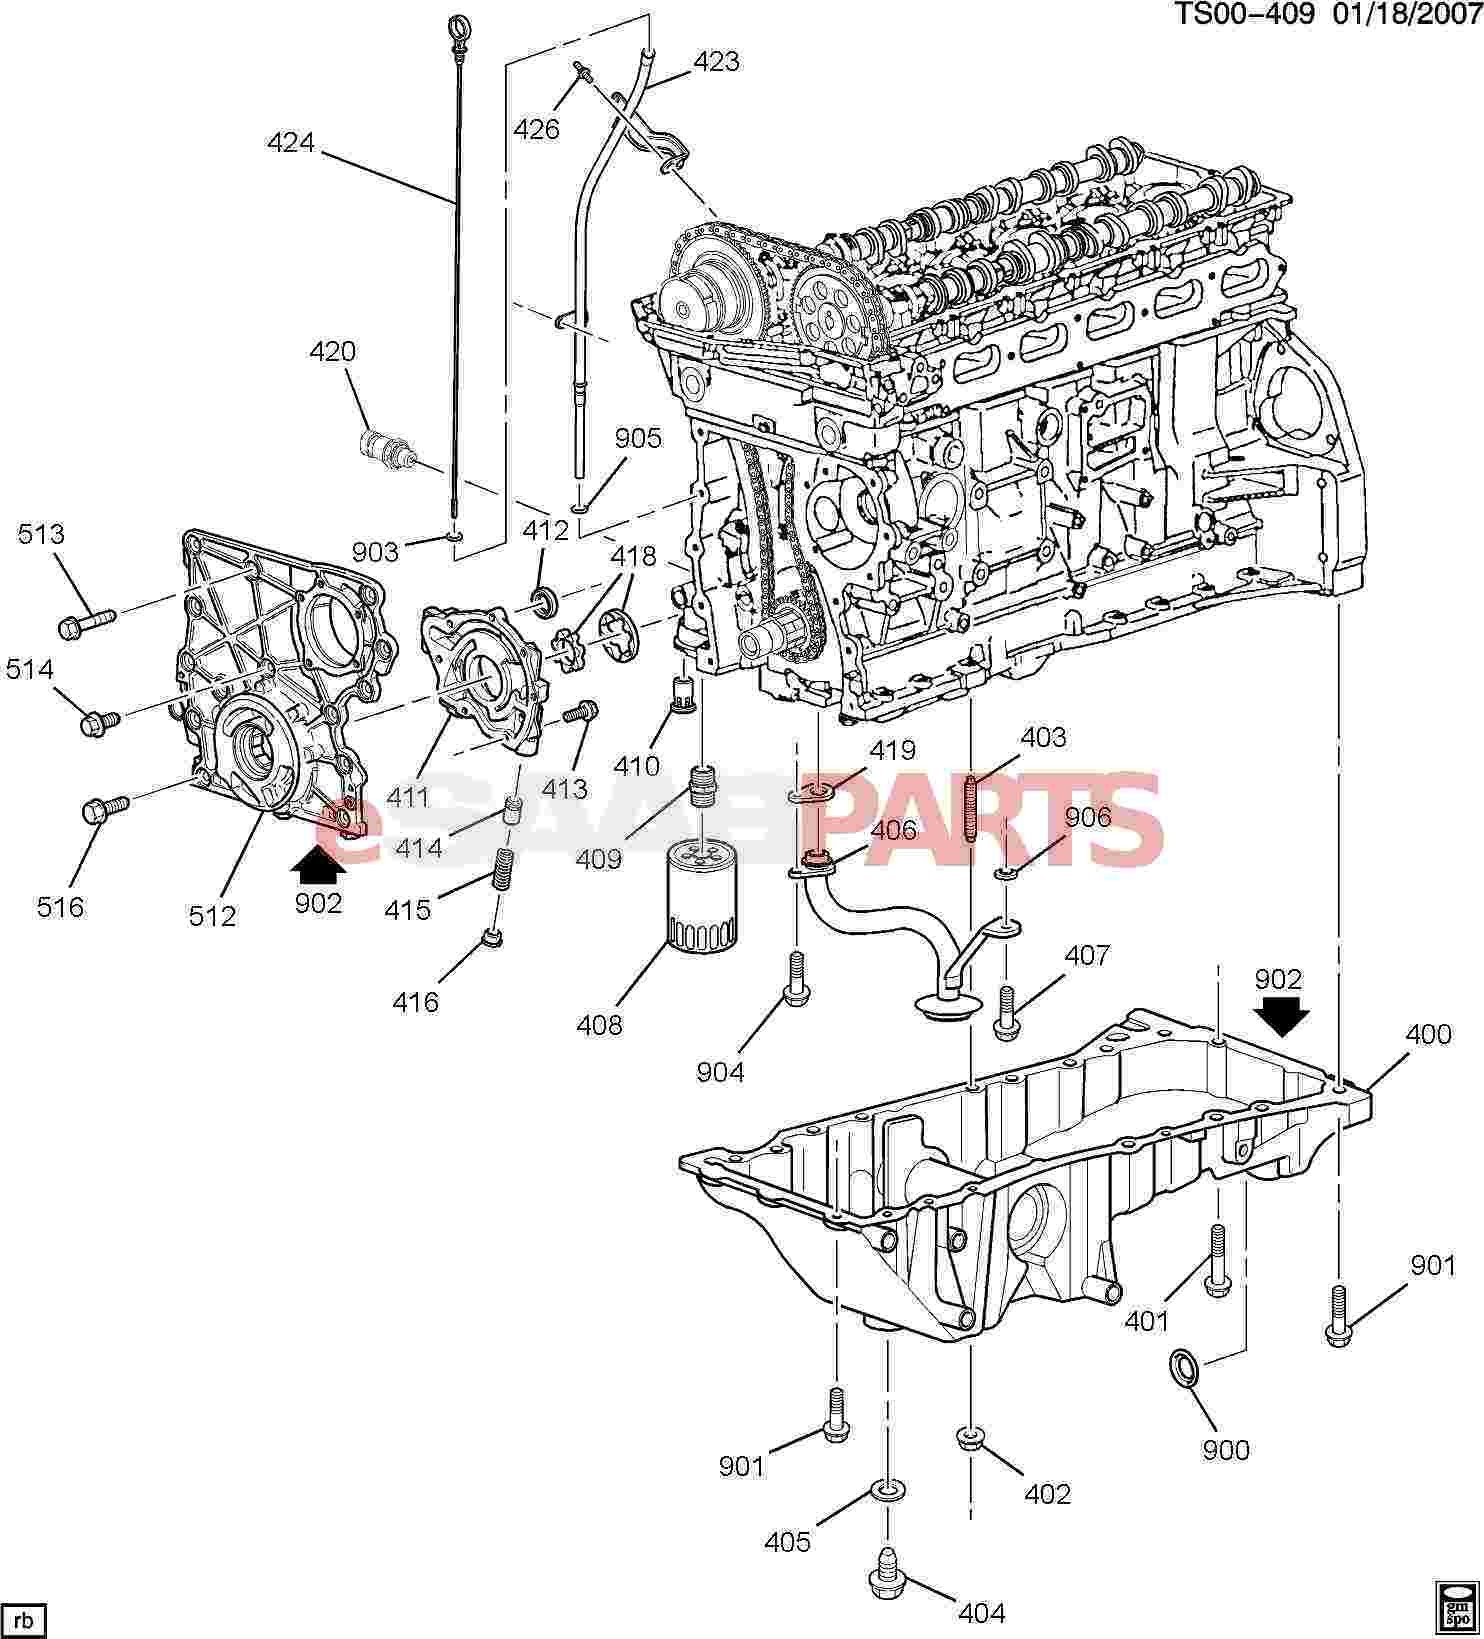 Auto Engine Parts Diagram Esaabparts Saab 9 7x Engine Parts Engine Internal 4 2s Of Auto Engine Parts Diagram